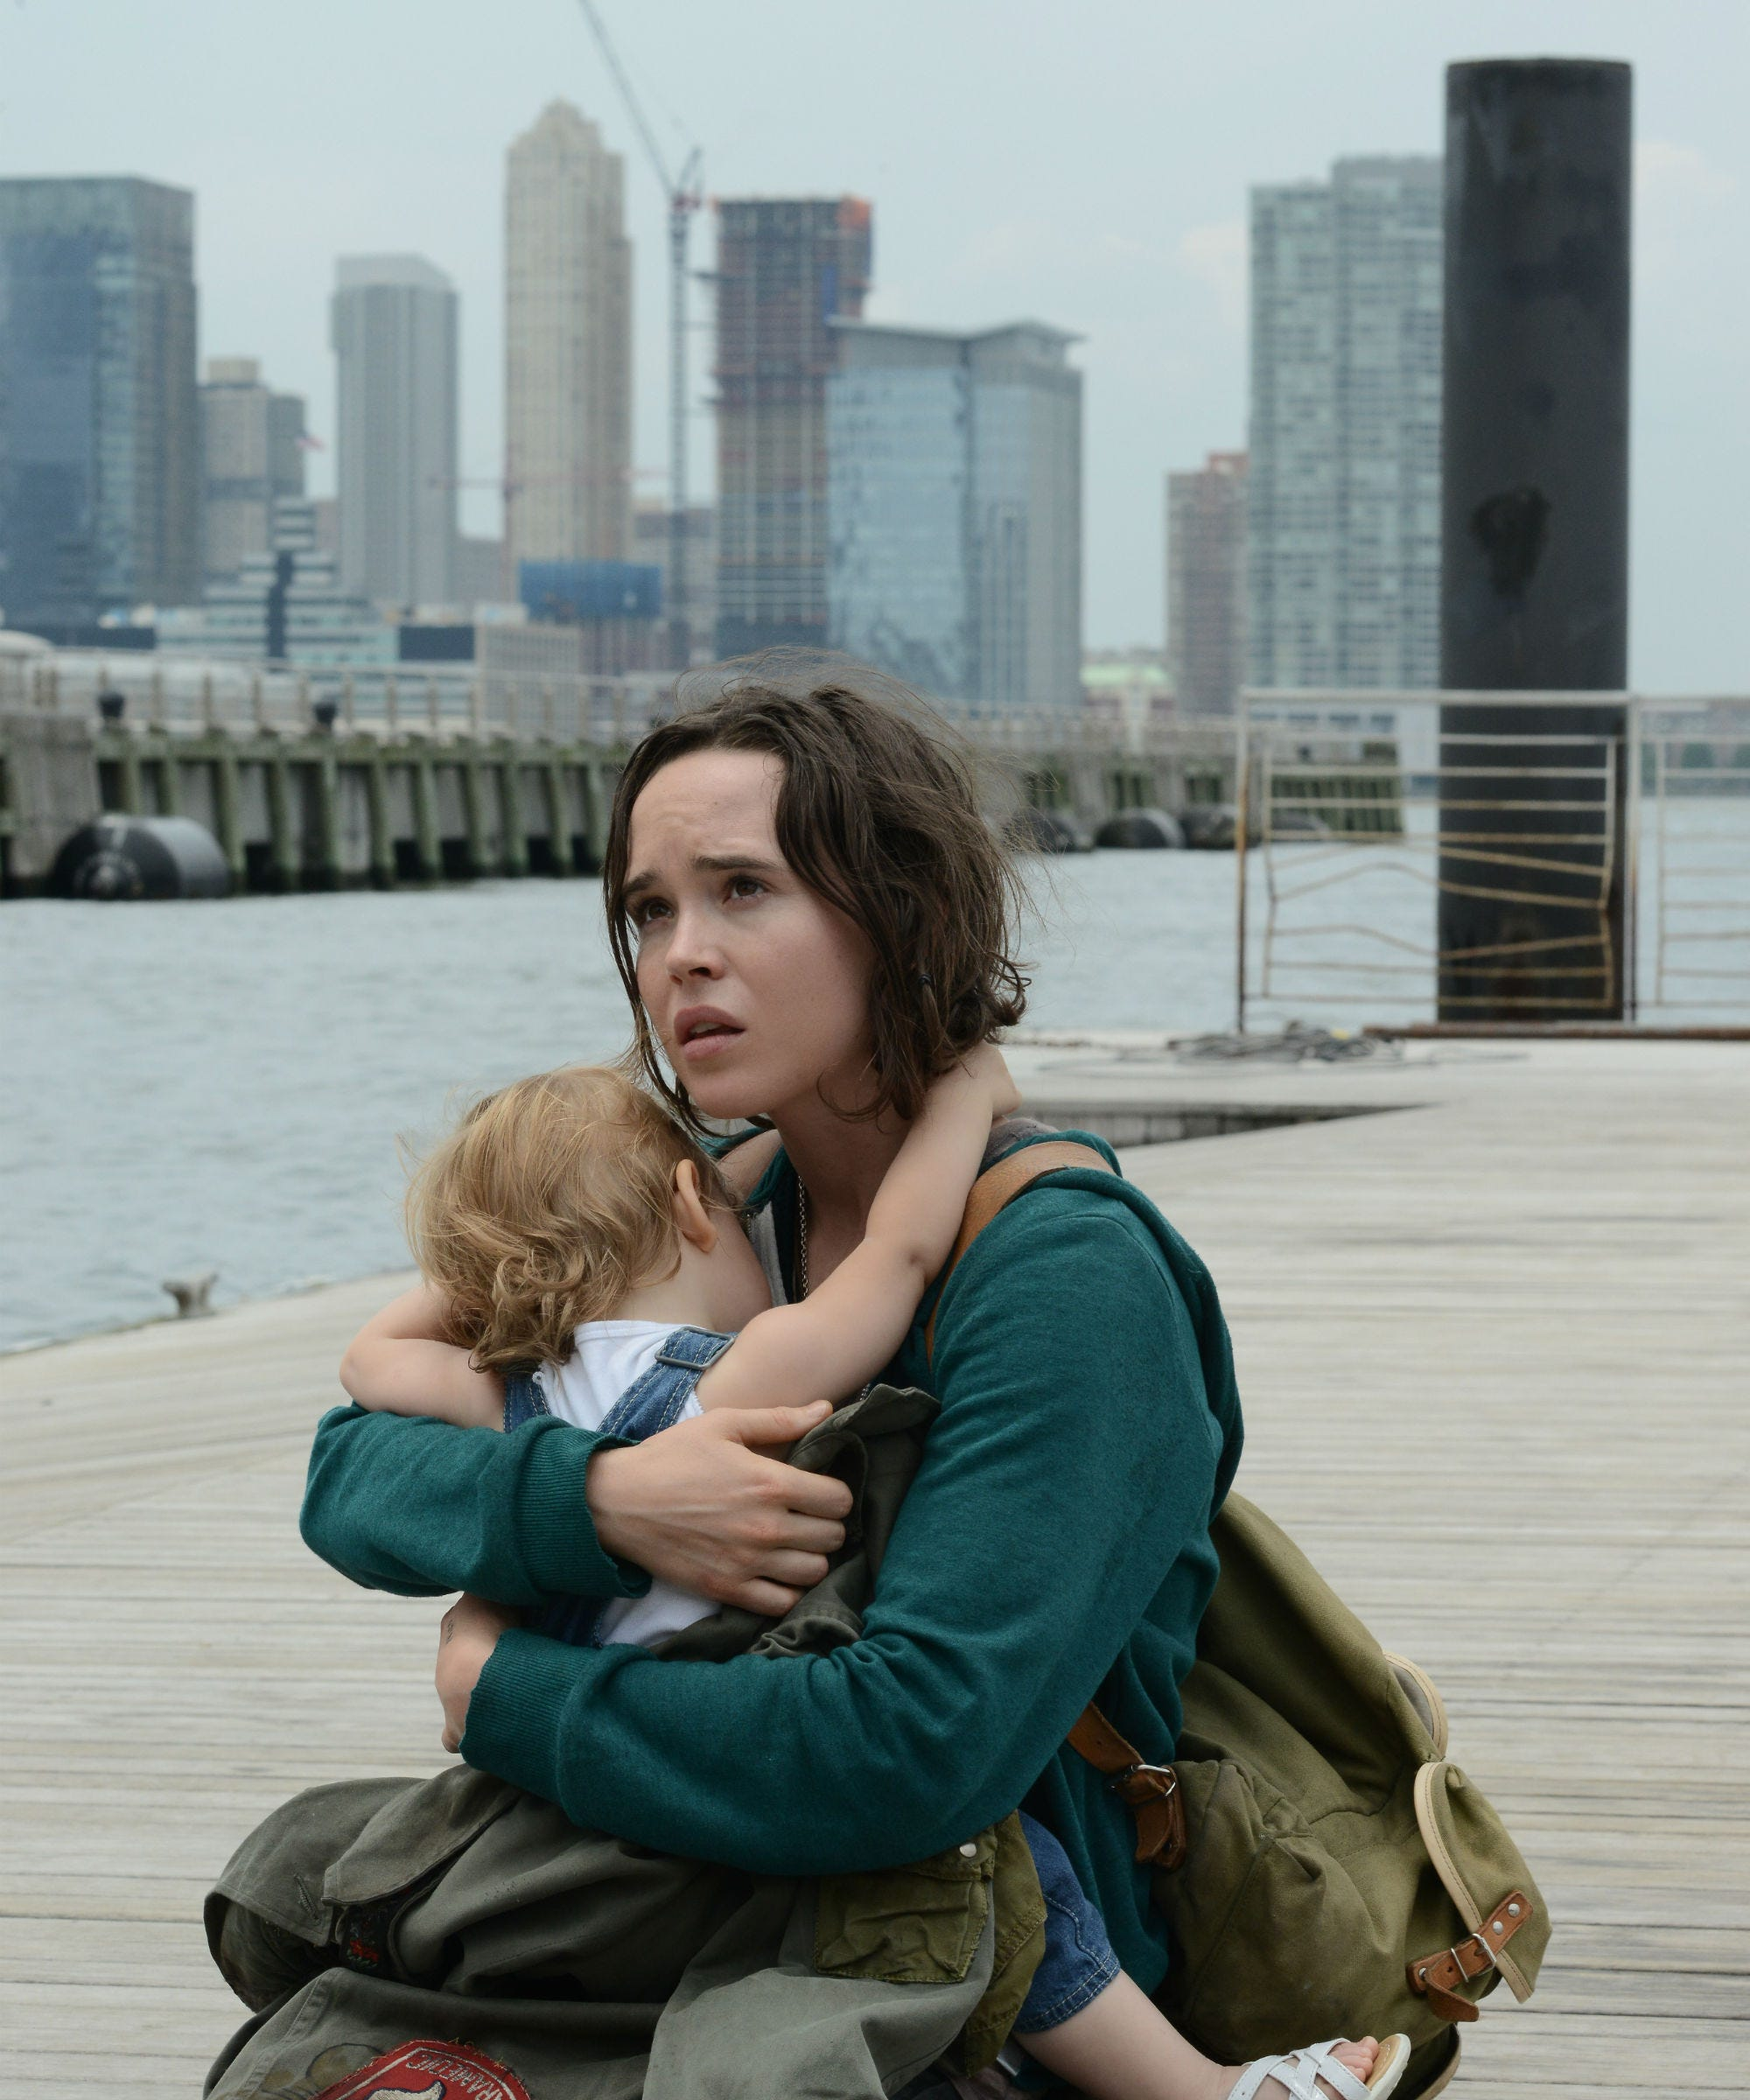 Best Indie Movies Newer Independent Films To Watch